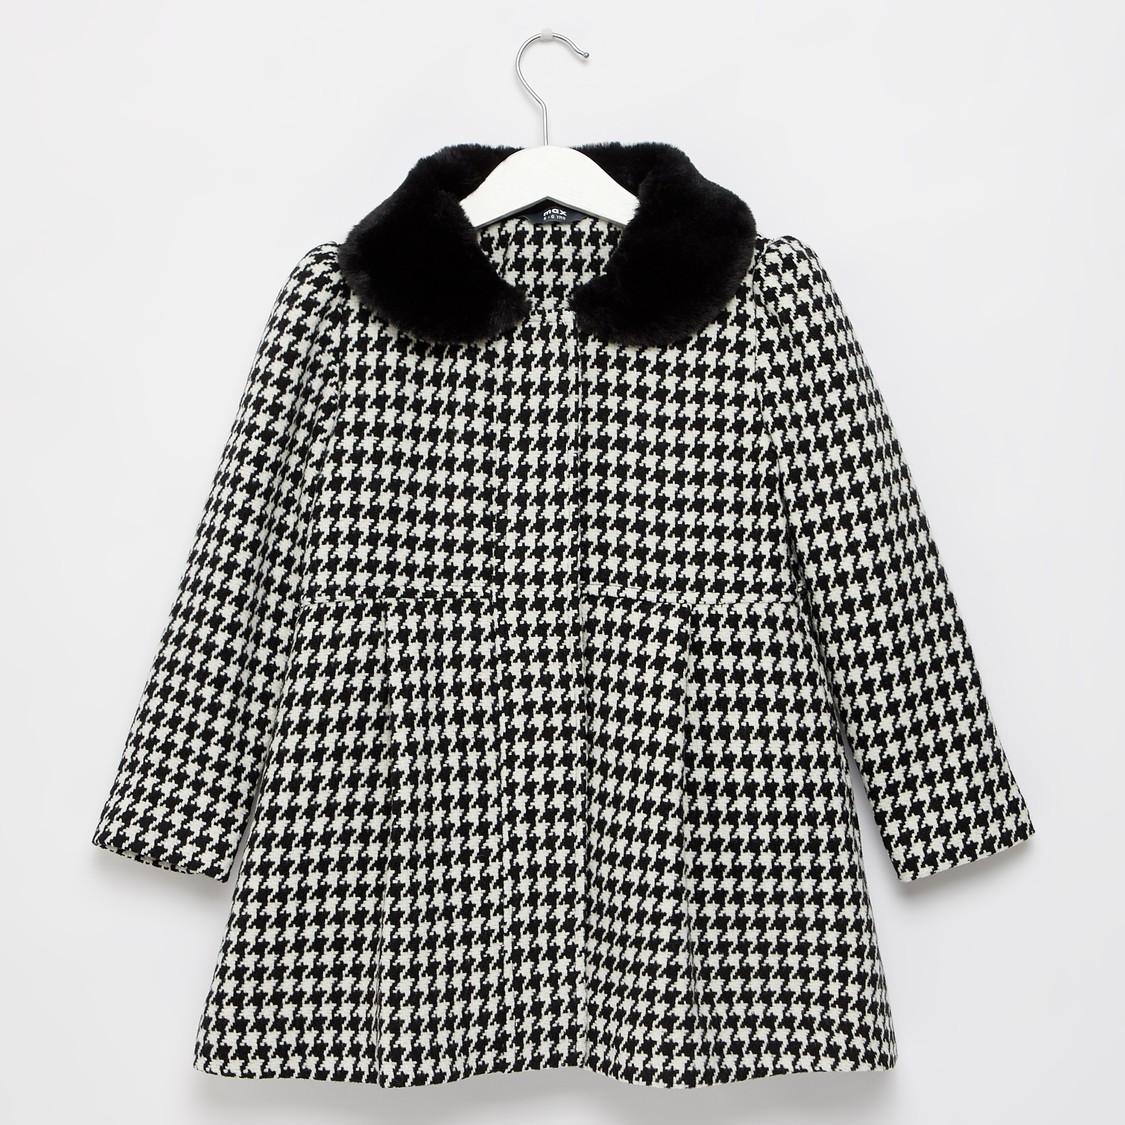 Houndstooth Checks Print Coat with Textured Peter Pan Collar